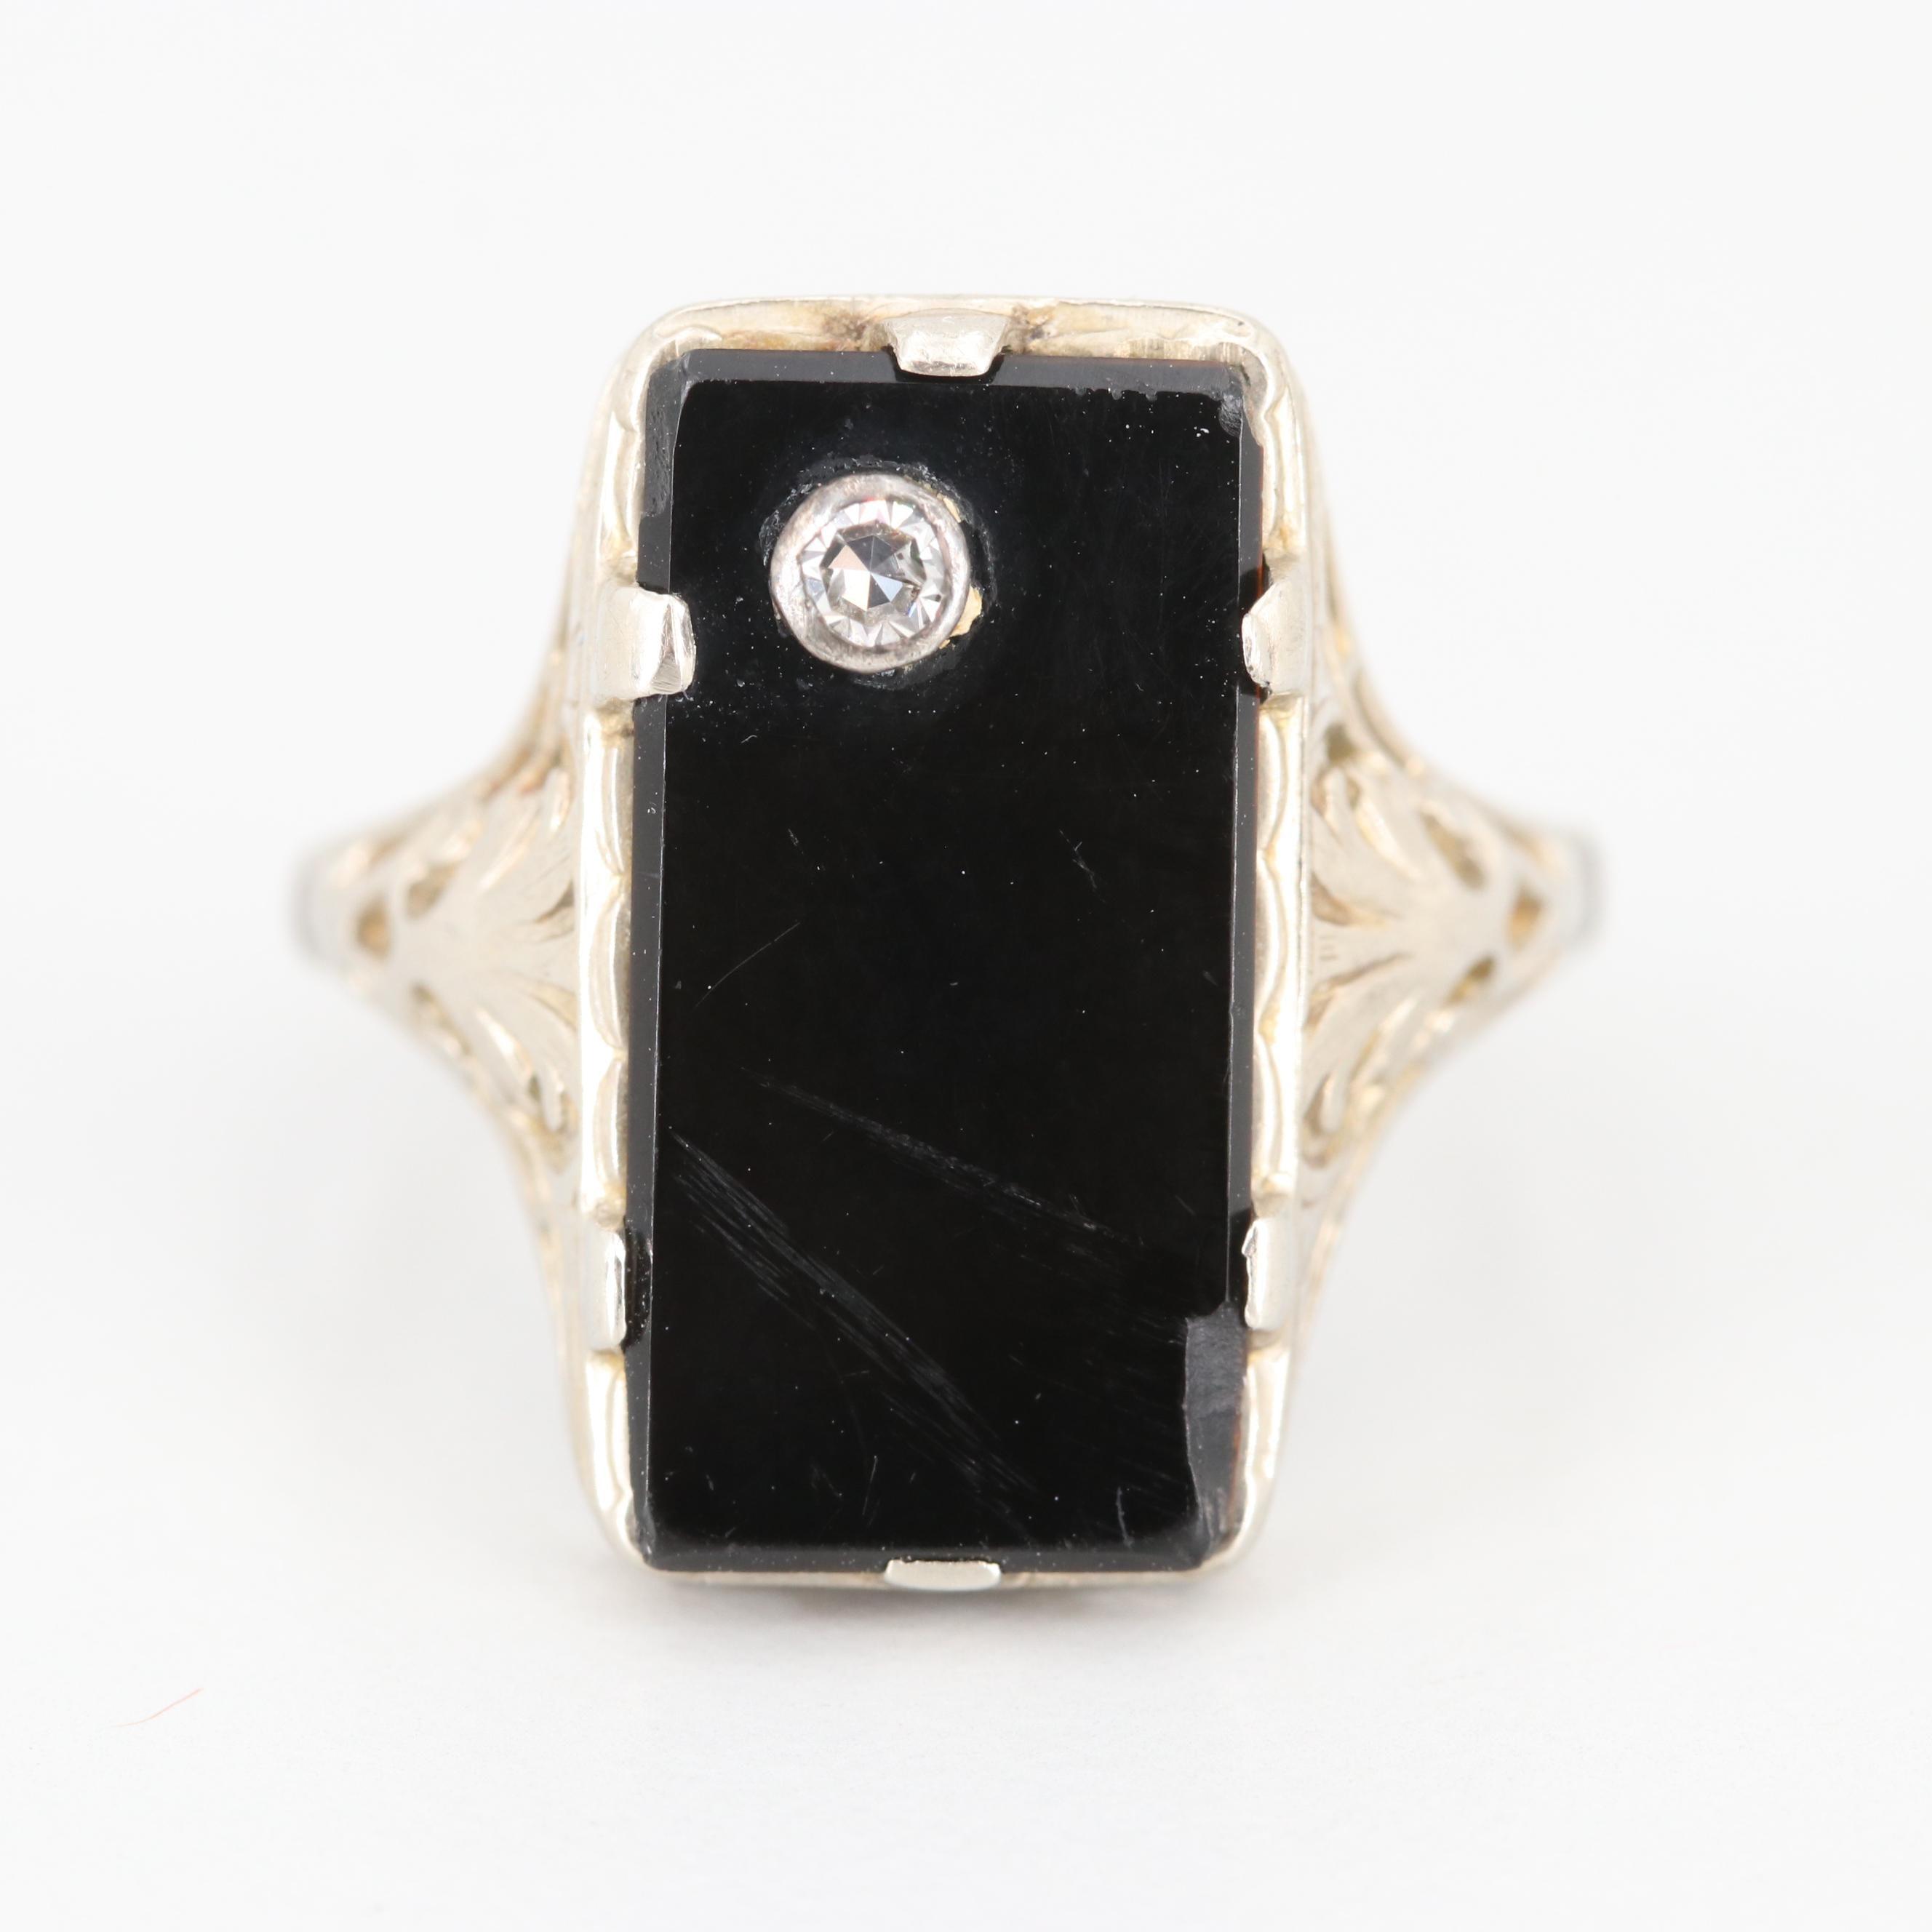 Art Deco 14K White Gold Black Onyx and Diamond Ring